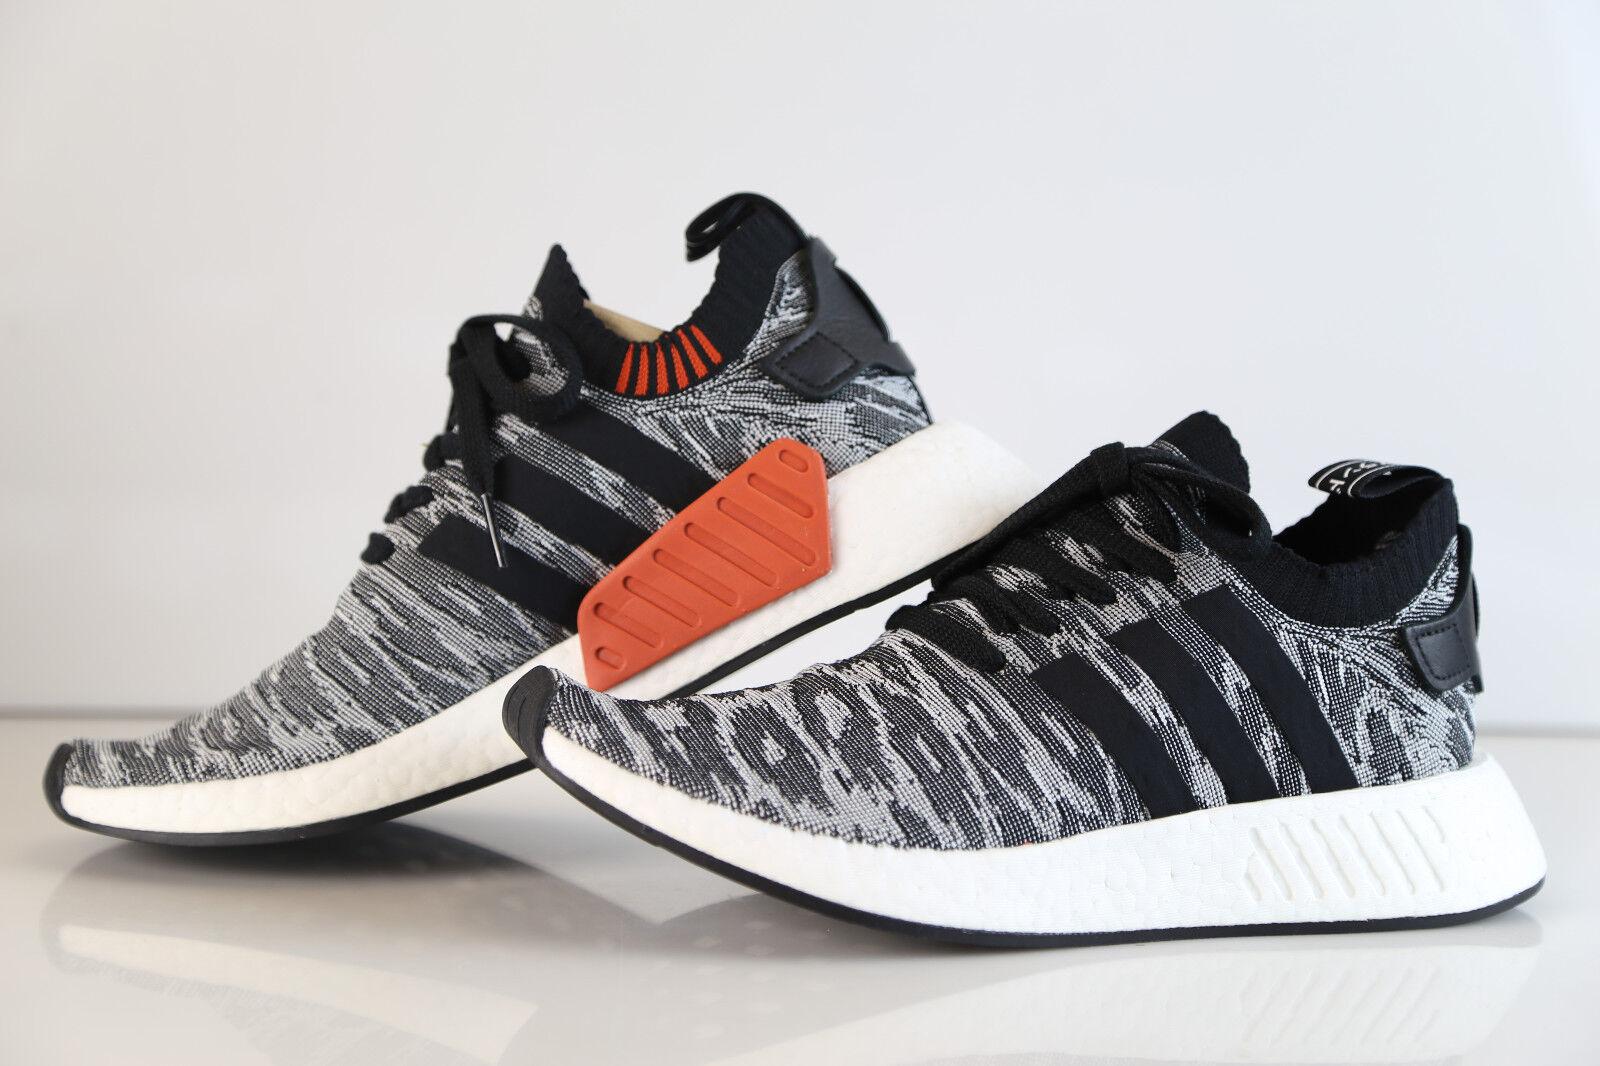 Adidas NMD R2 PK Tiger Camo Black White Glitch BY9409 7-13 boost prime knit r1 3